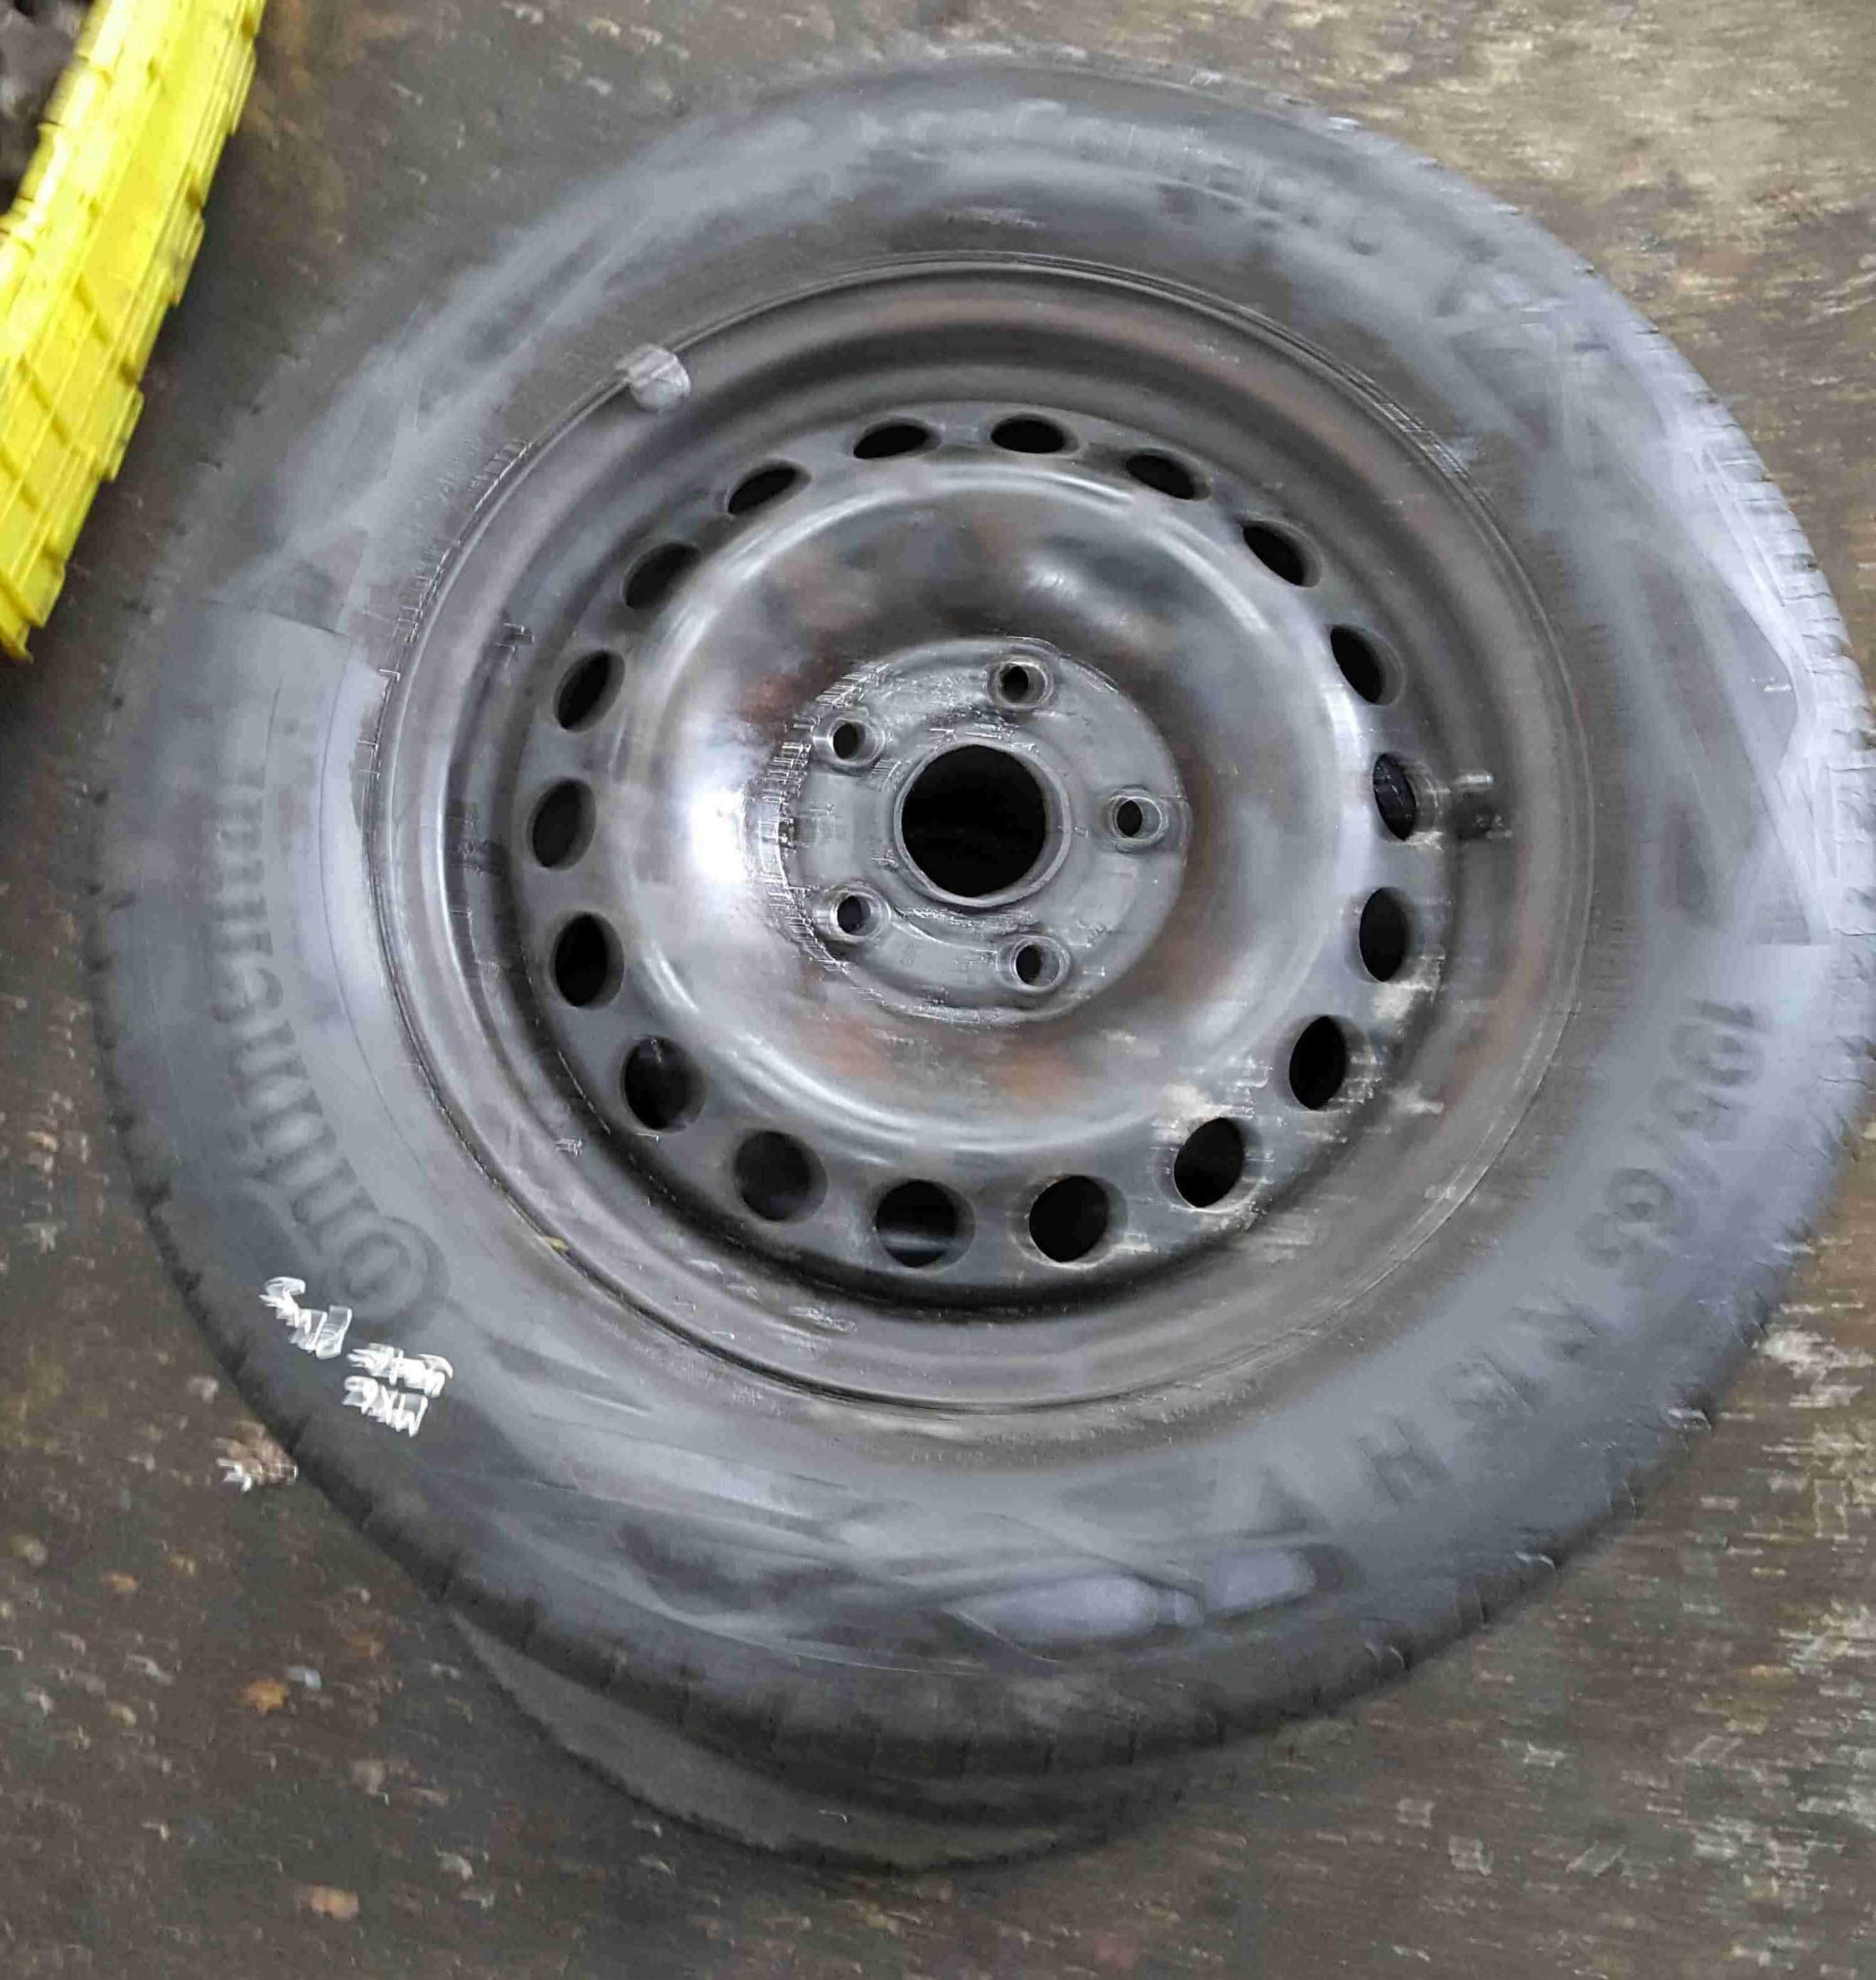 Volkswagen Golf MK6 2009-2012 Spare Steel Wheel Rim + Tyre 195 65 15 6mm